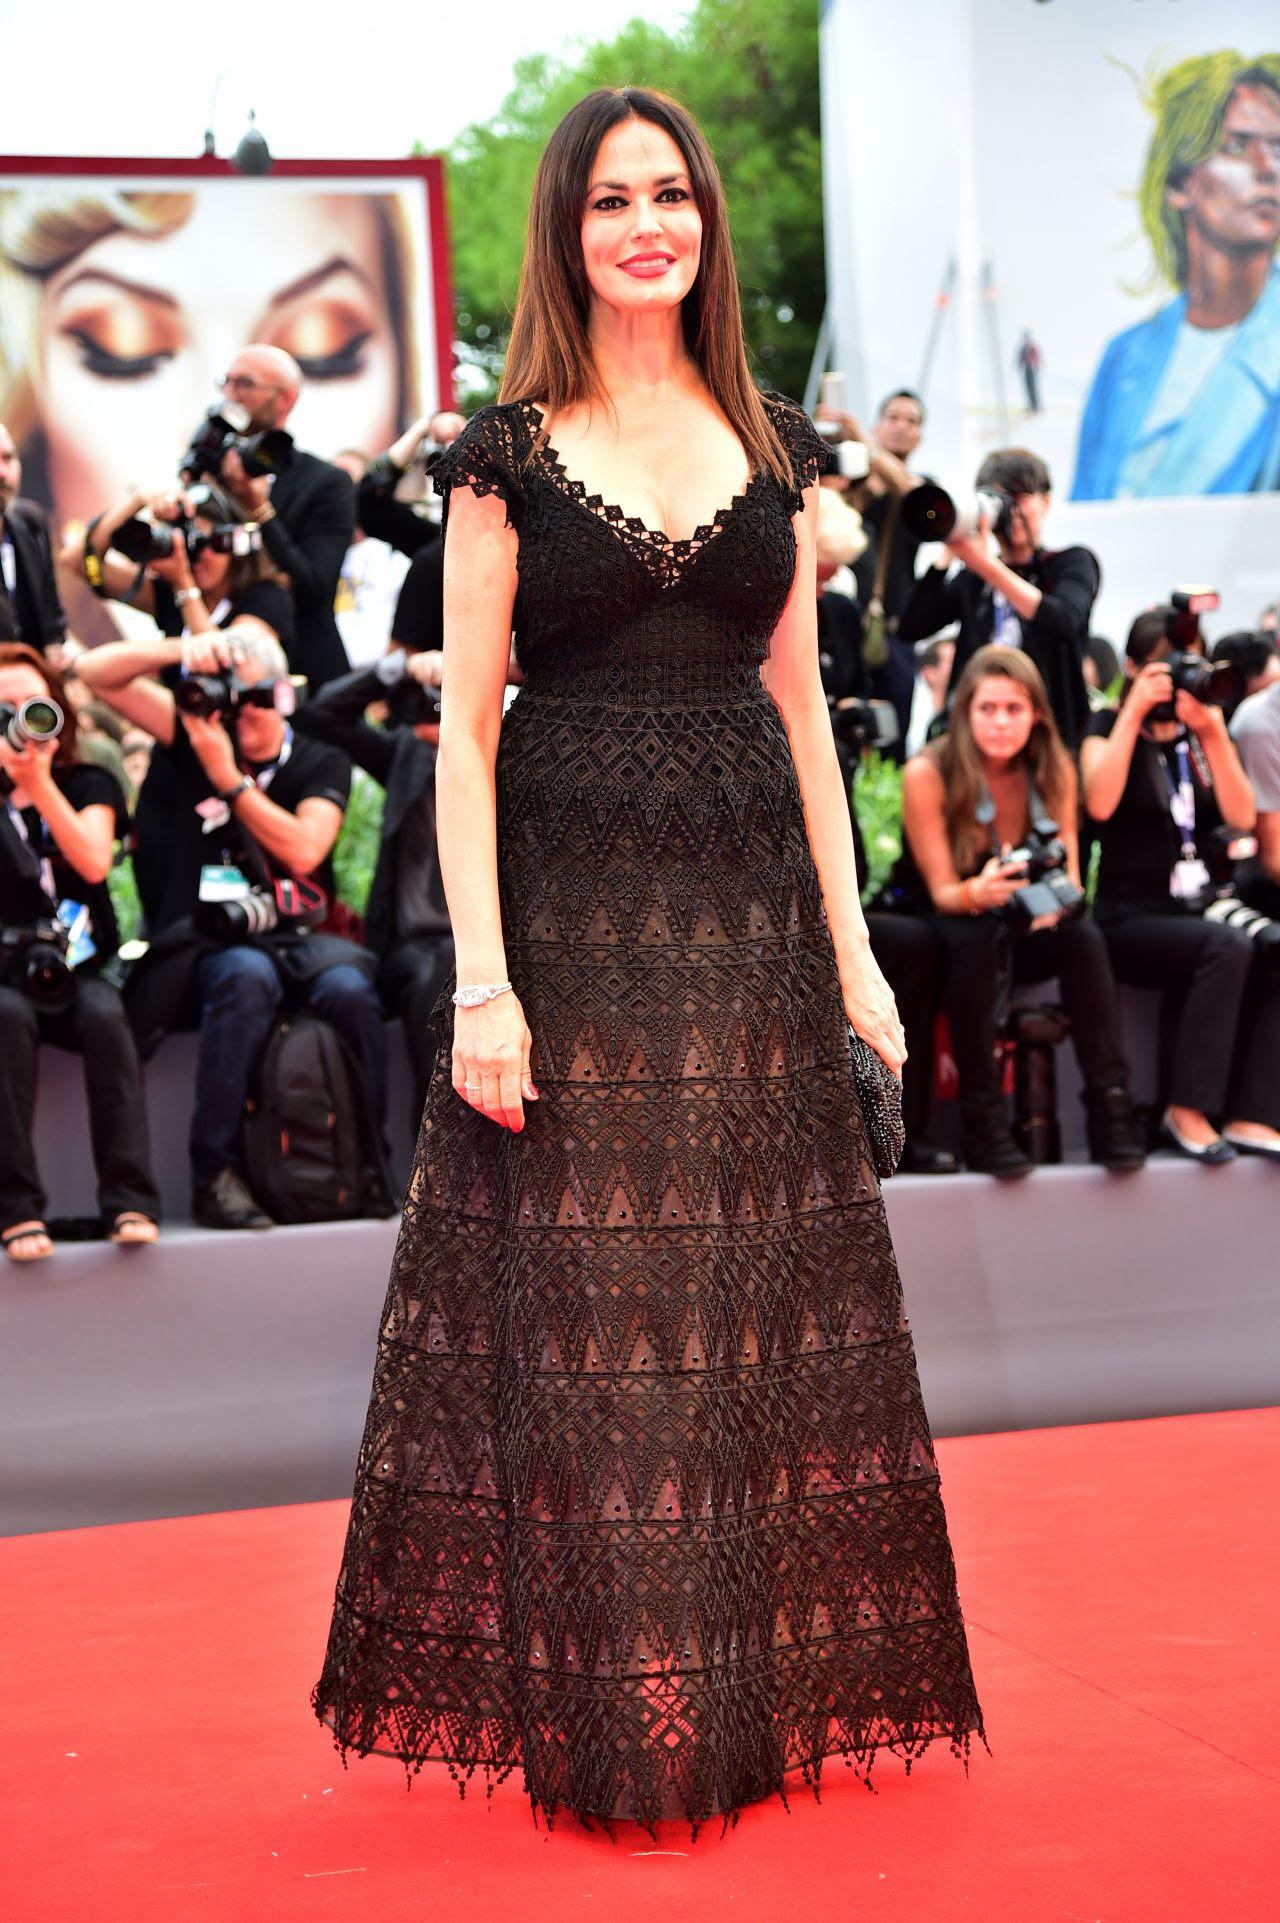 http://celebmafia.com/wp-content/uploads/2015/09/maria-grazia-cucinotta-opening-ceremony-and-premiere-of-everest-2015-venice-film-festival_6.jpg